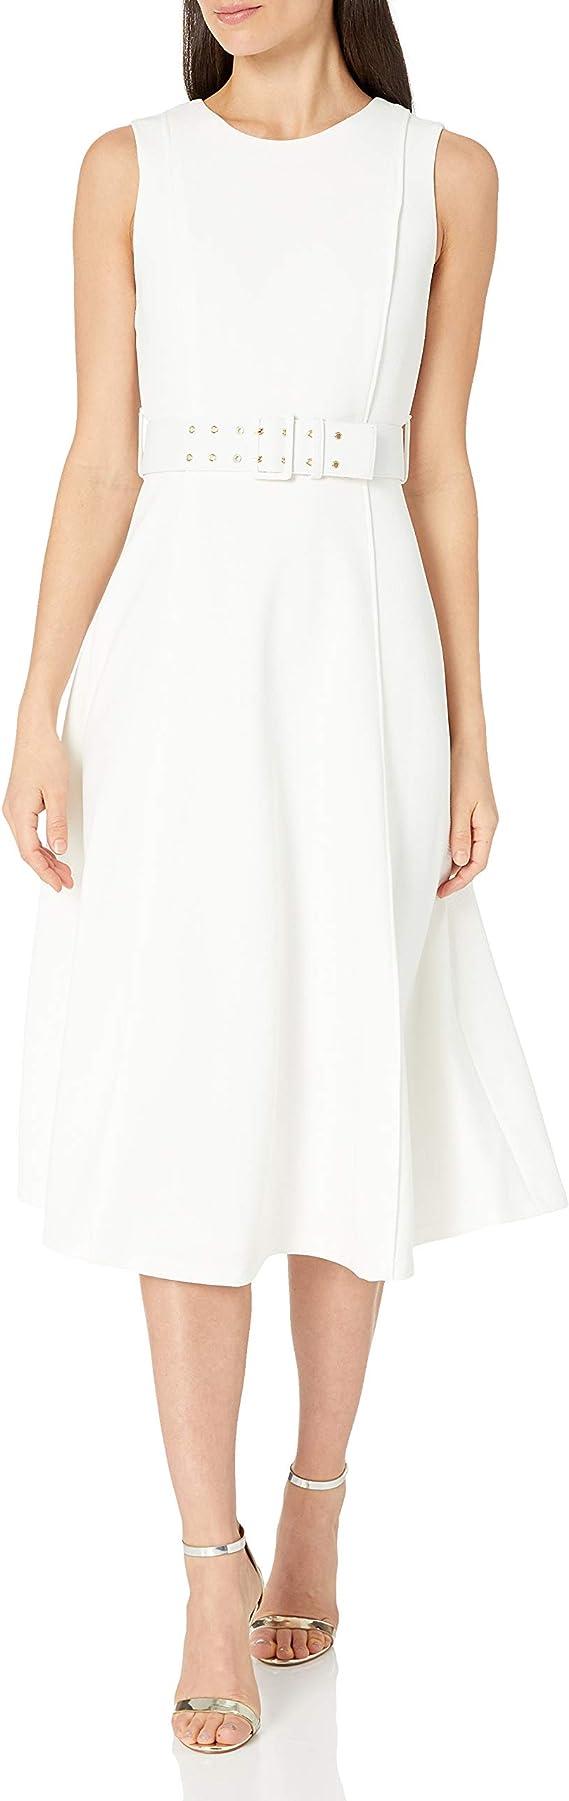 Calvin Klein 卡尔文克莱因 CK 无袖A字形连衣裙 配腰带 8码3.1折$42.46 海淘转运到手约¥318